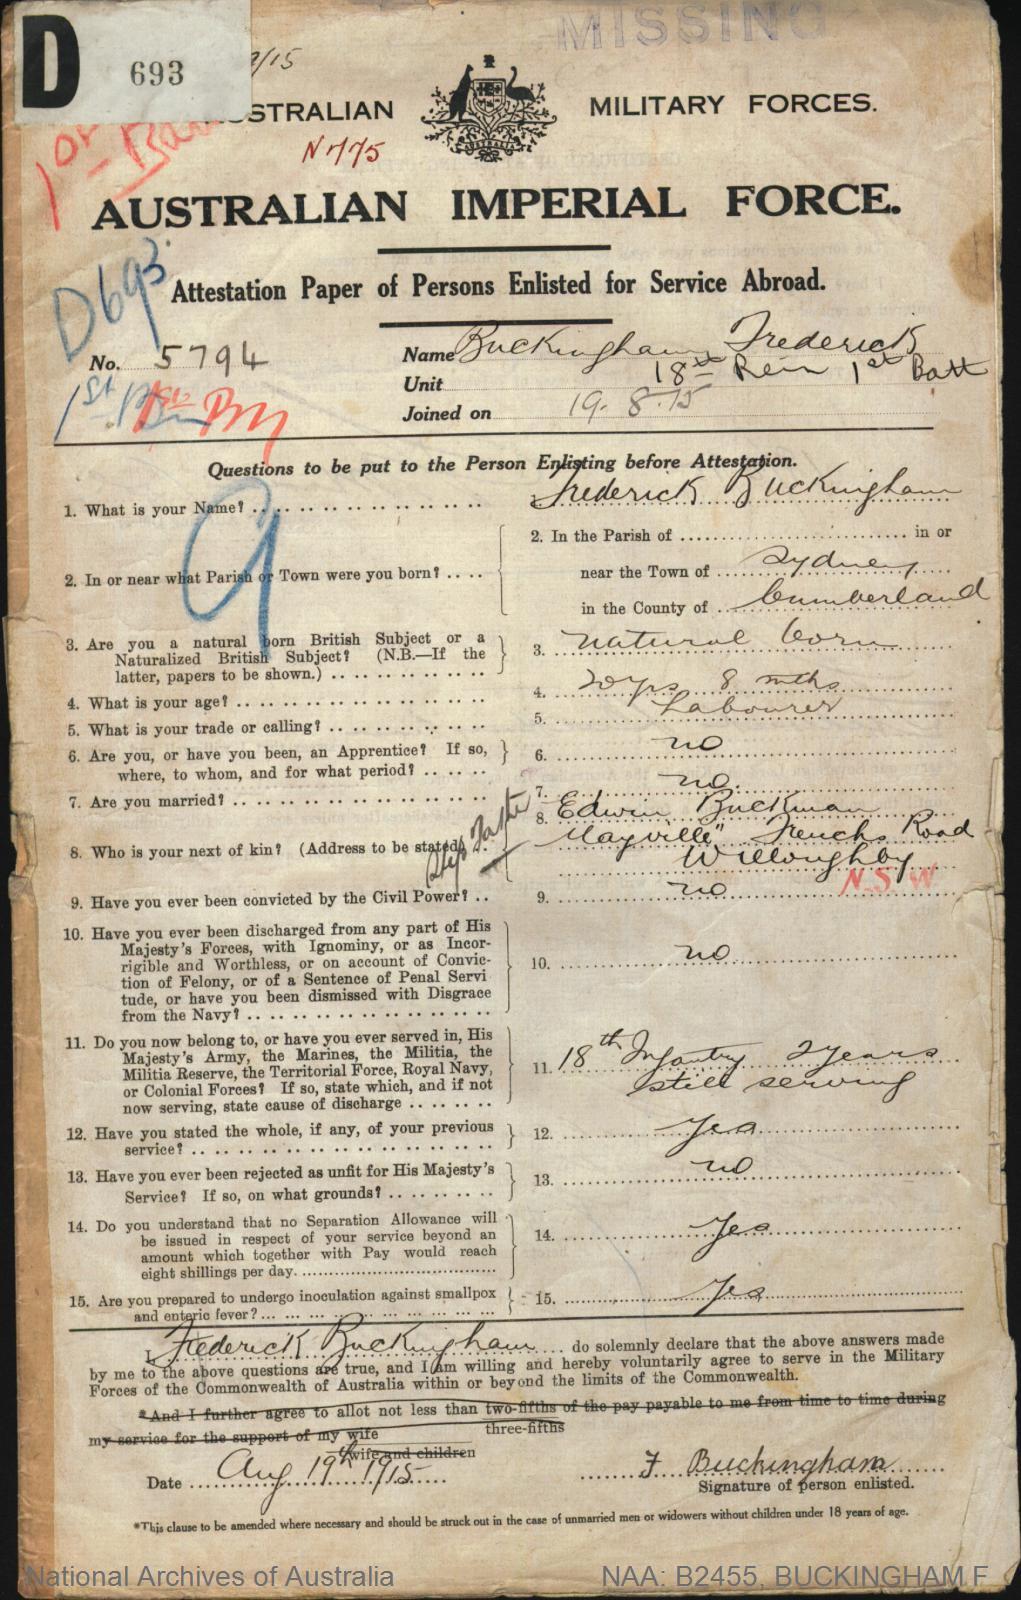 Buckingham Frederick : SERN 5794 : POB Sydney NSW : POE Goulburn NSW : NOK Buckman Edwin